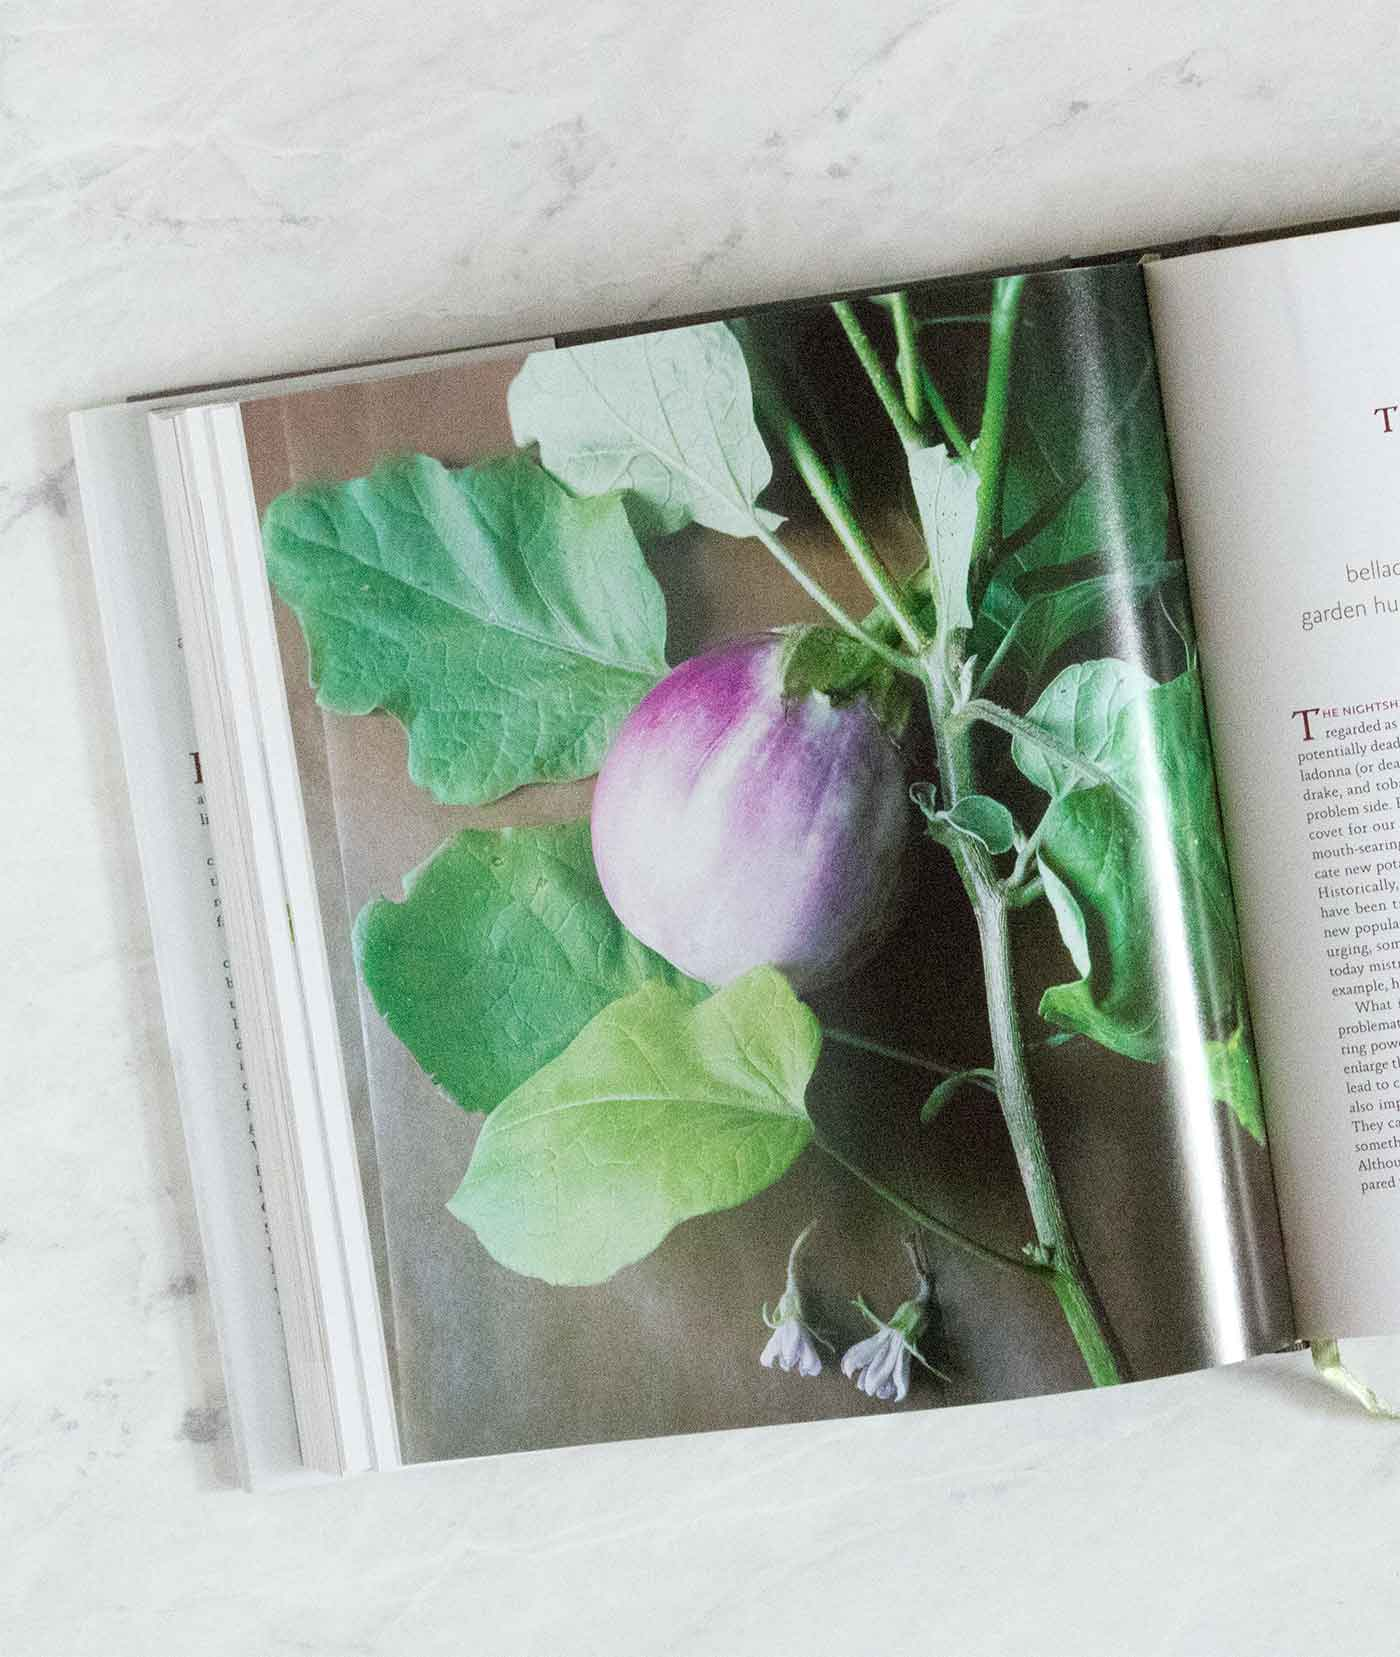 Favorite Vegetarian Cookbooks